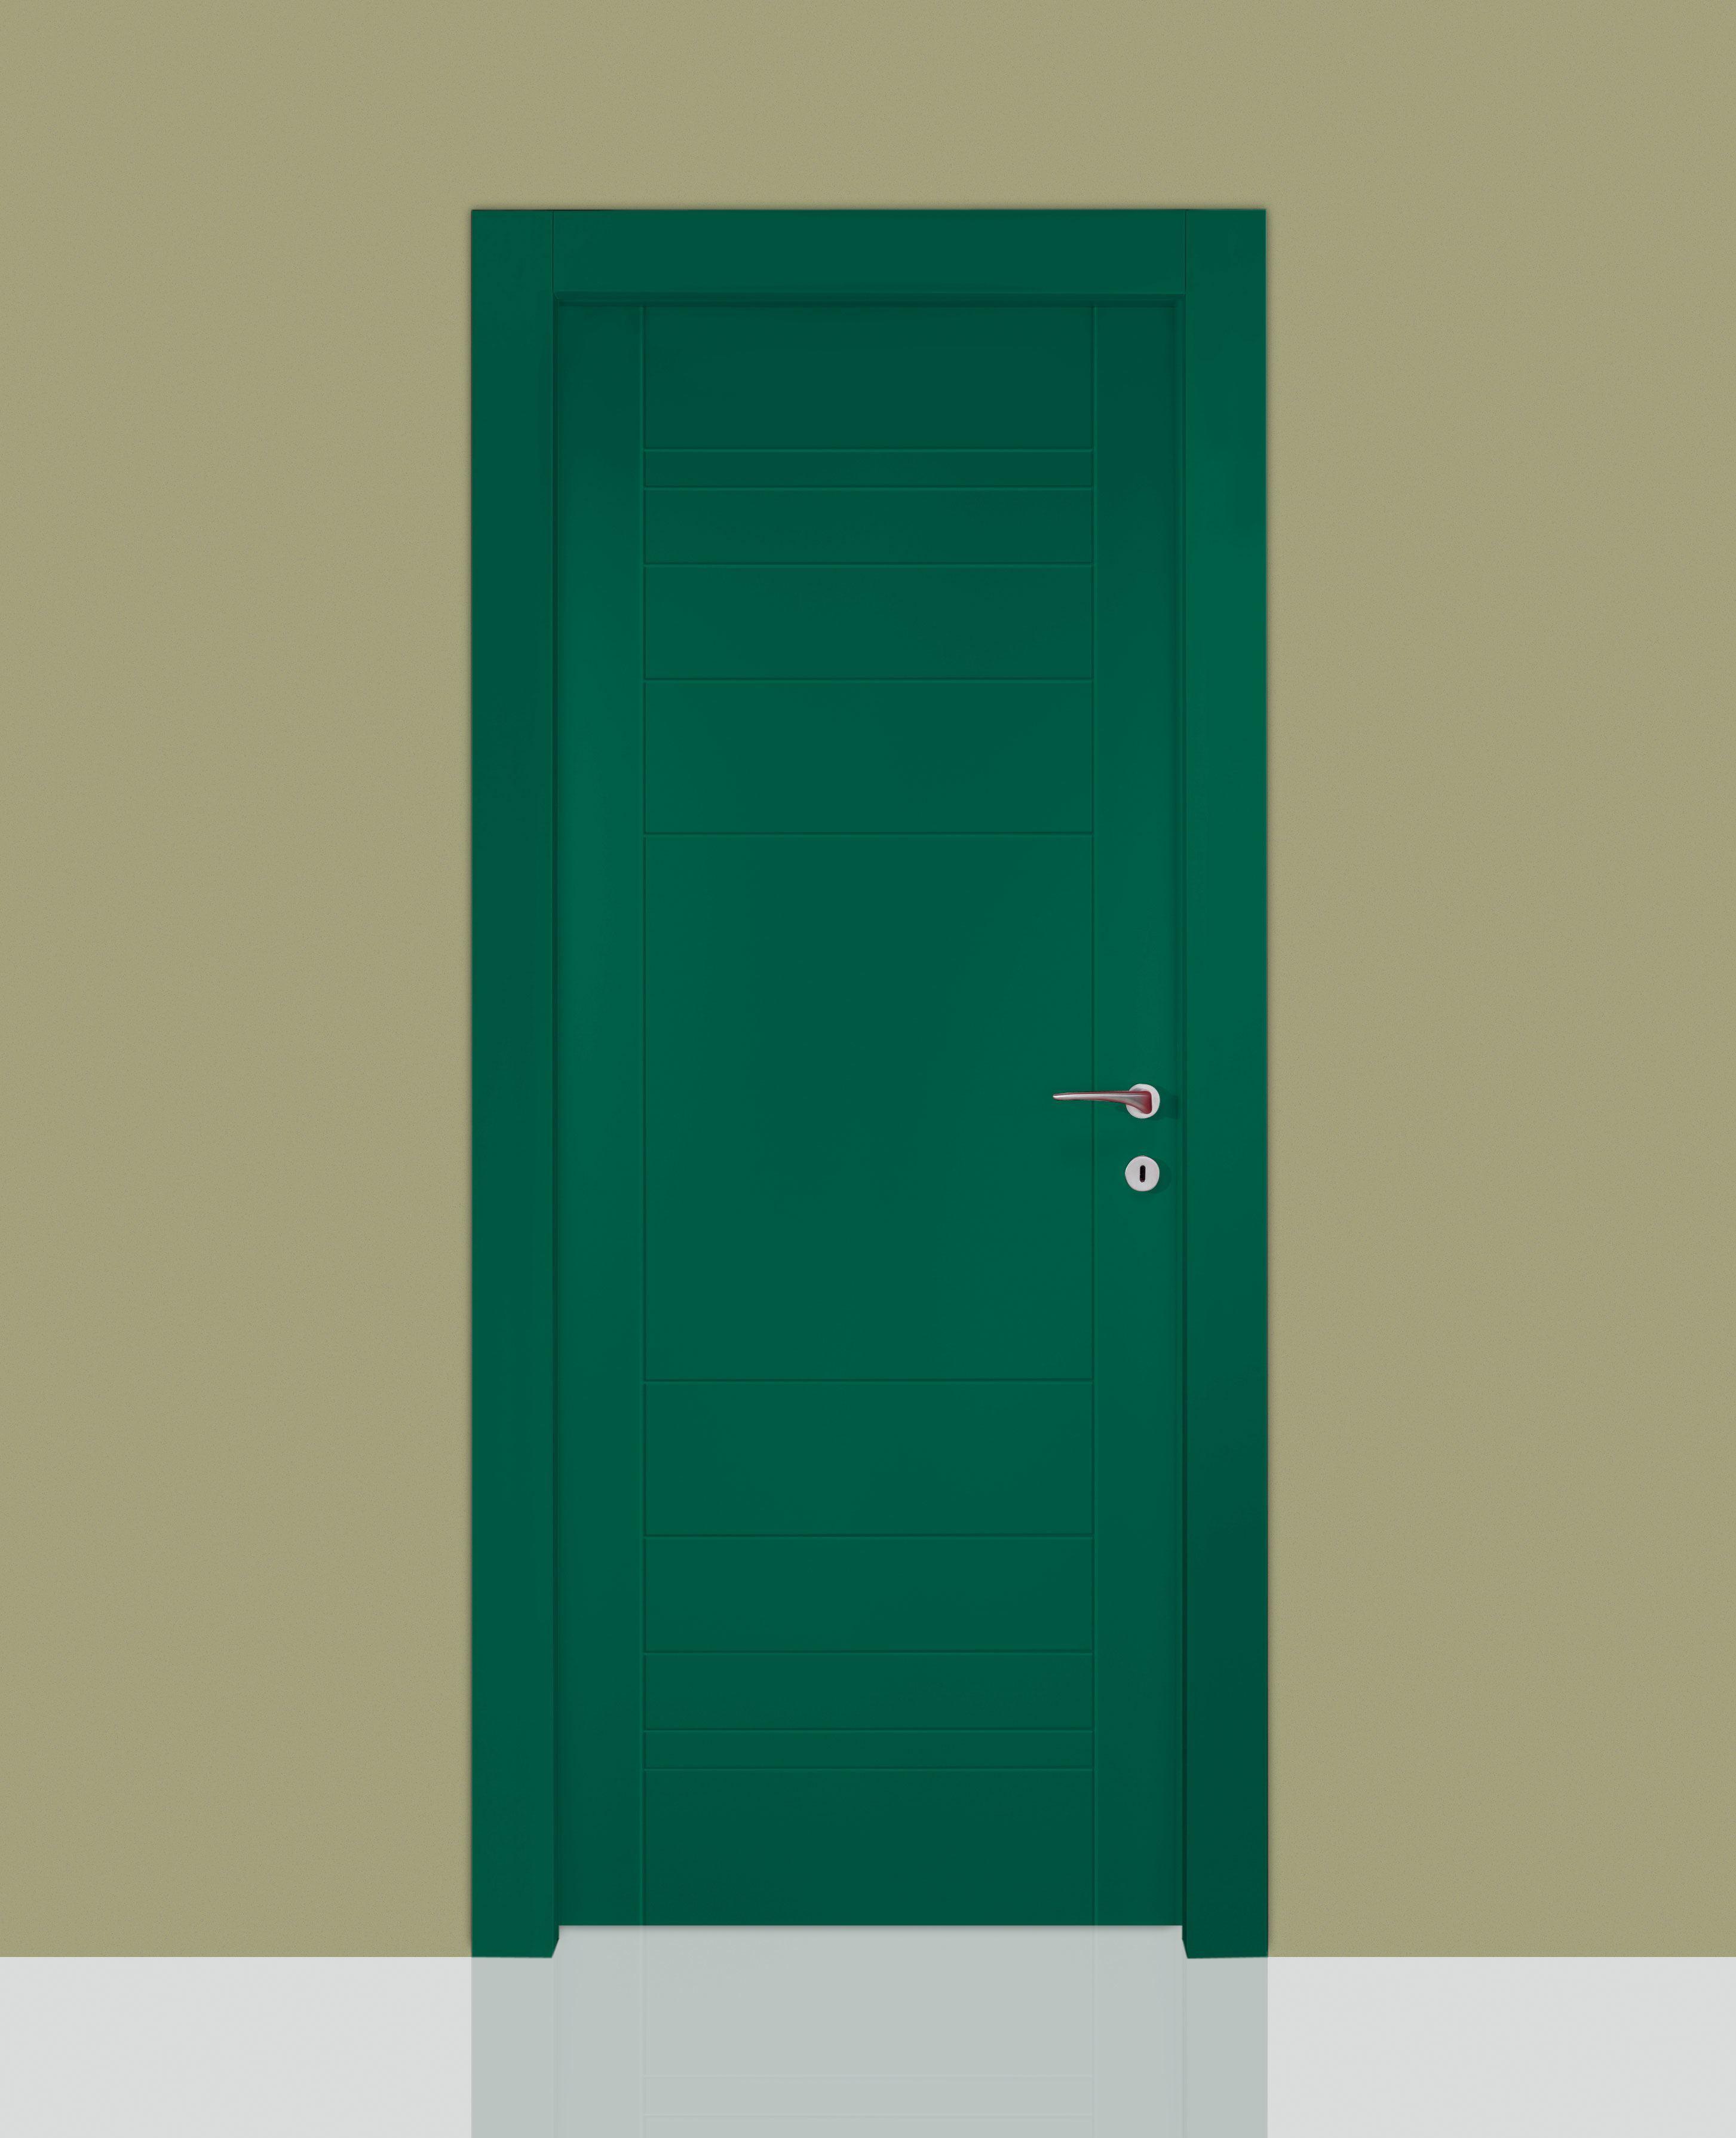 Best porte a libro prezzi economici images ridgewayng - Porte interne leroy merlin prezzi ...